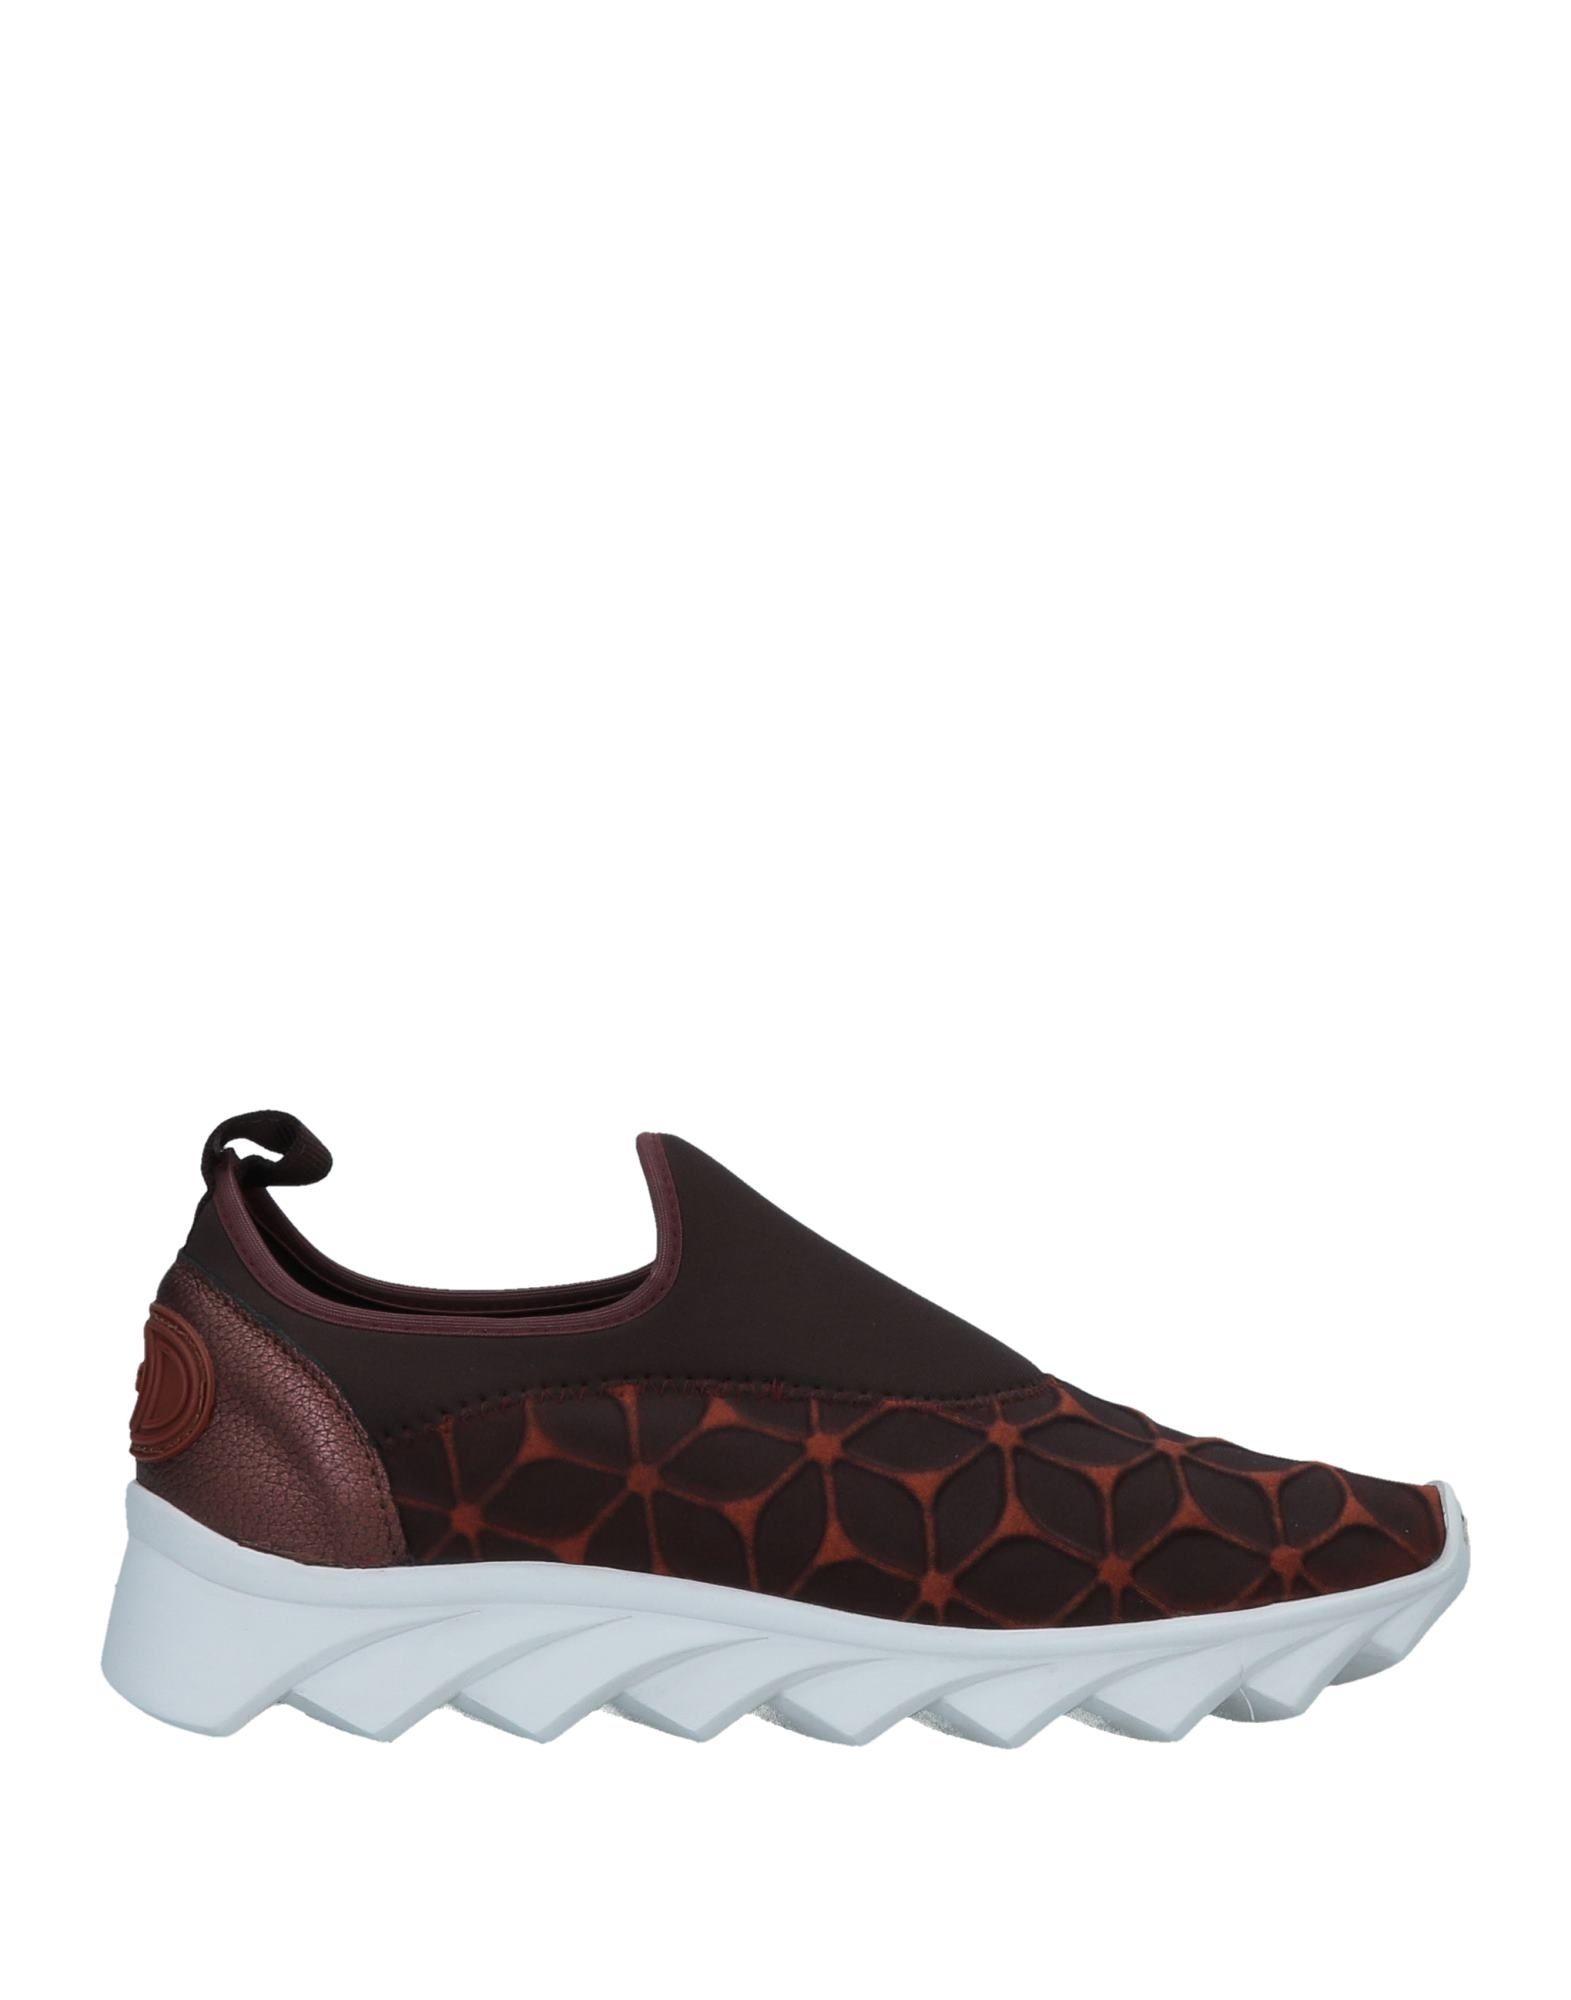 Sneakers comode Ras Donna - 11511545CE Scarpe comode Sneakers e distintive a38134